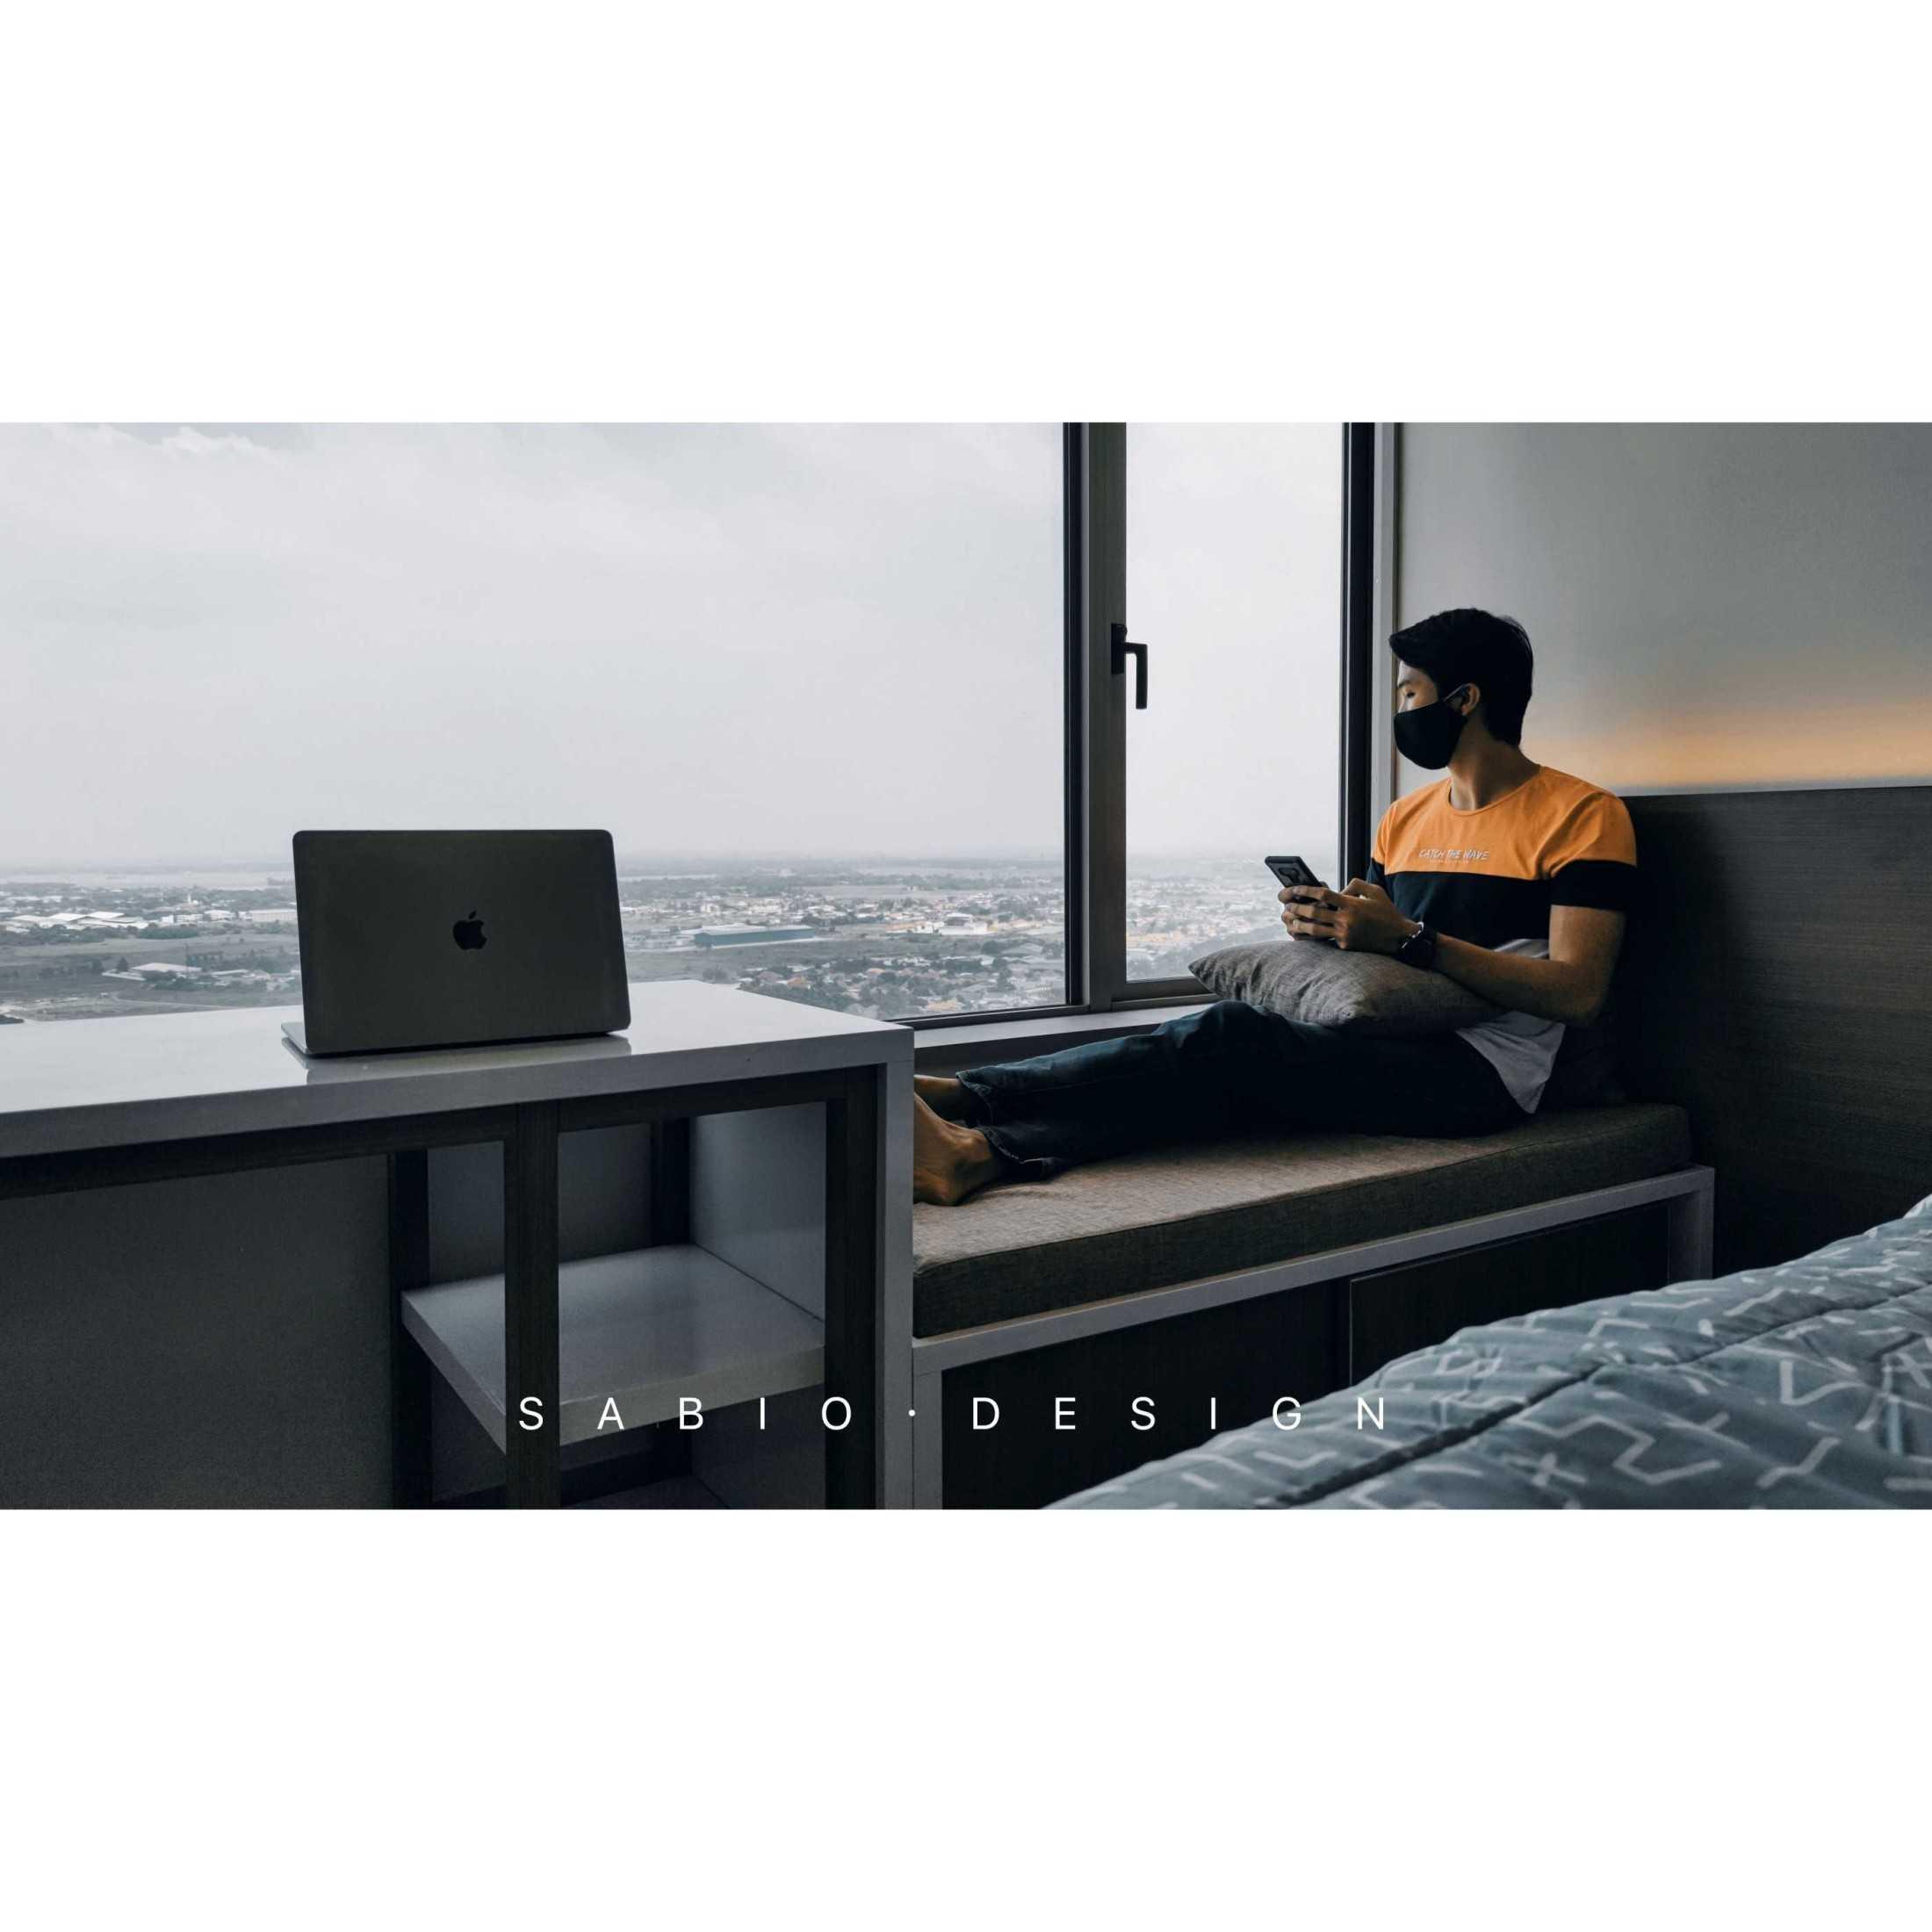 Sabio Design Interior Apartment Orange County Cibatu, Cikarang Sel., Bekasi, Jawa Barat 17530, Indonesia Cibatu, Cikarang Sel., Bekasi, Jawa Barat 17530, Indonesia Sabio-Design-Interior-Apartment-Orange-County  119919